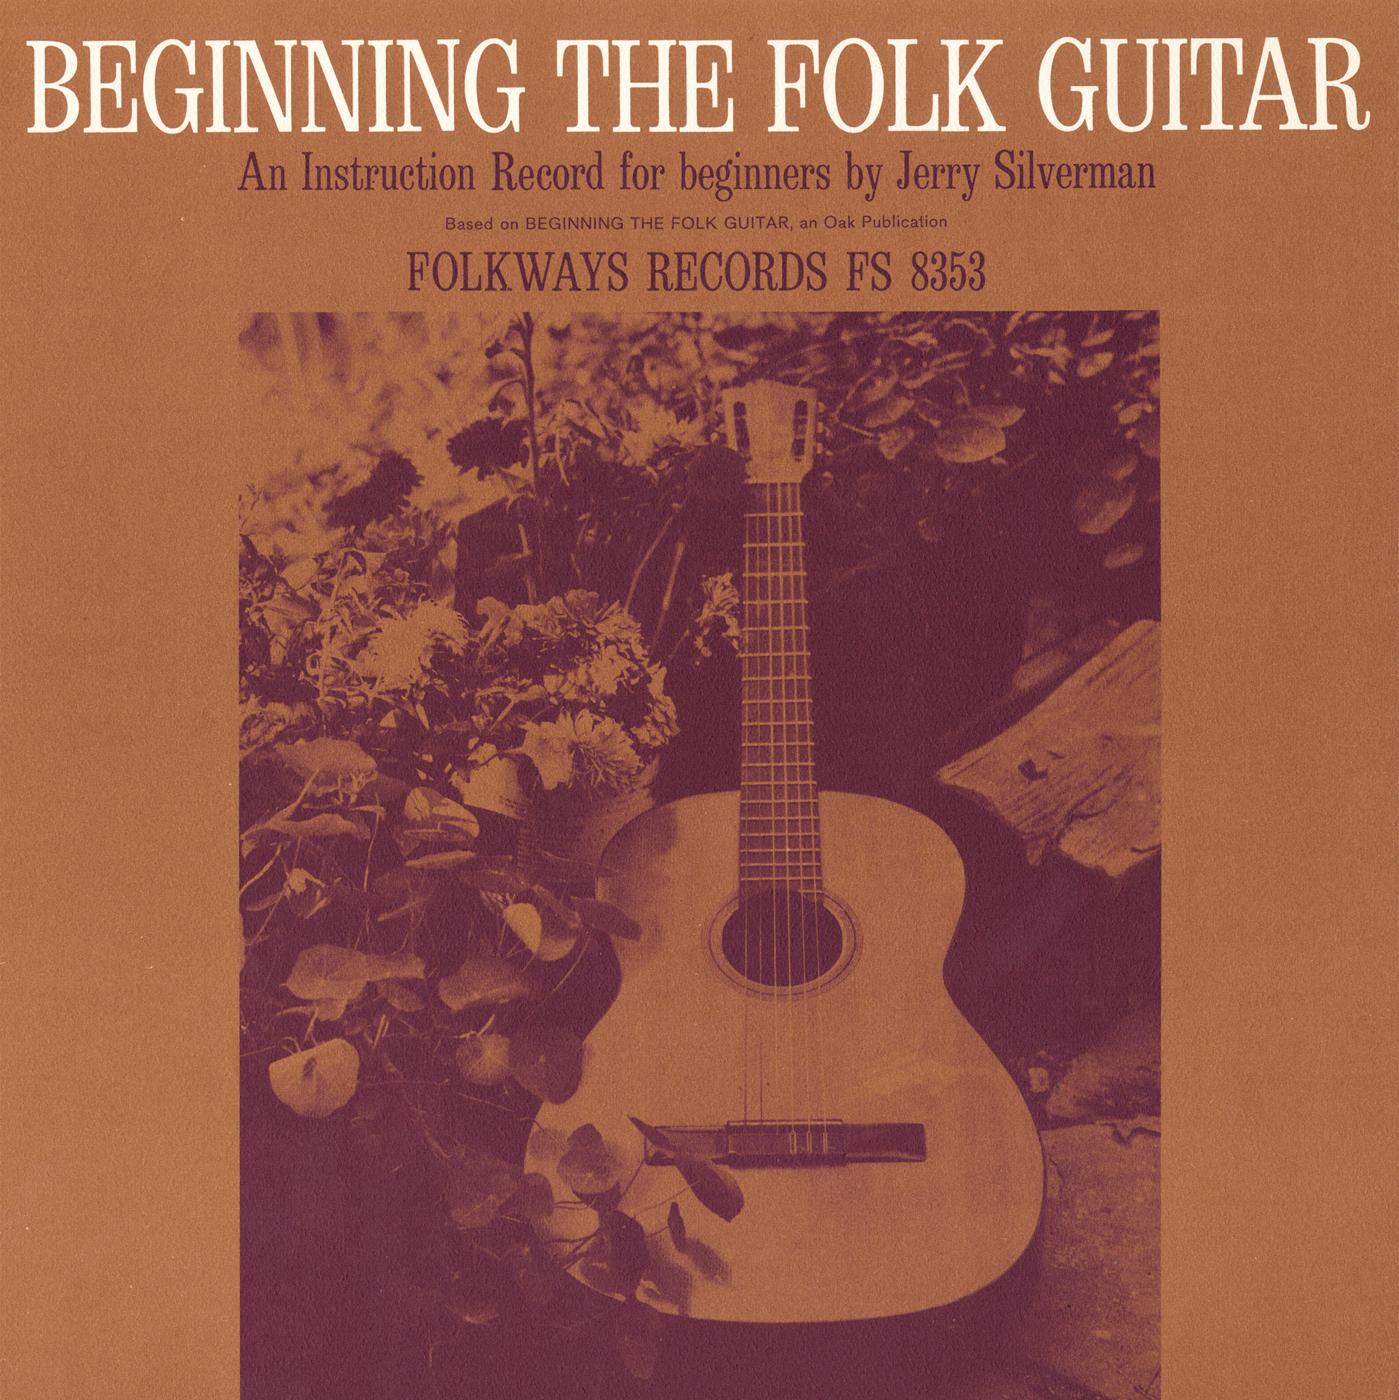 Food Book Cover Guitar : Beginning folk guitar an instruction record for beginners